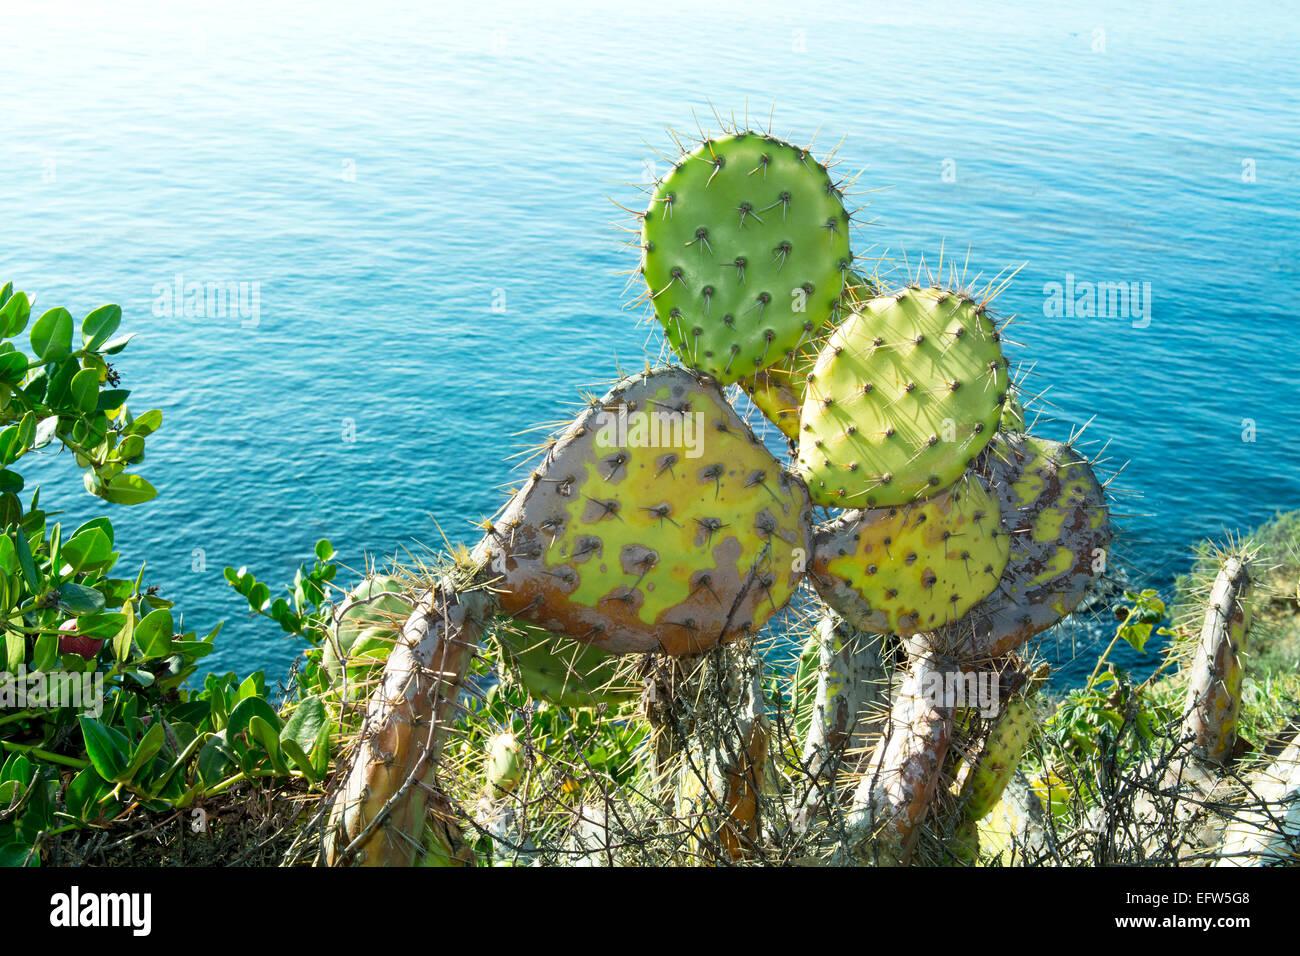 Colorful prickly pear cactus with sharp needles grows along the coastline of Laguna Beach, California. Stock Photo